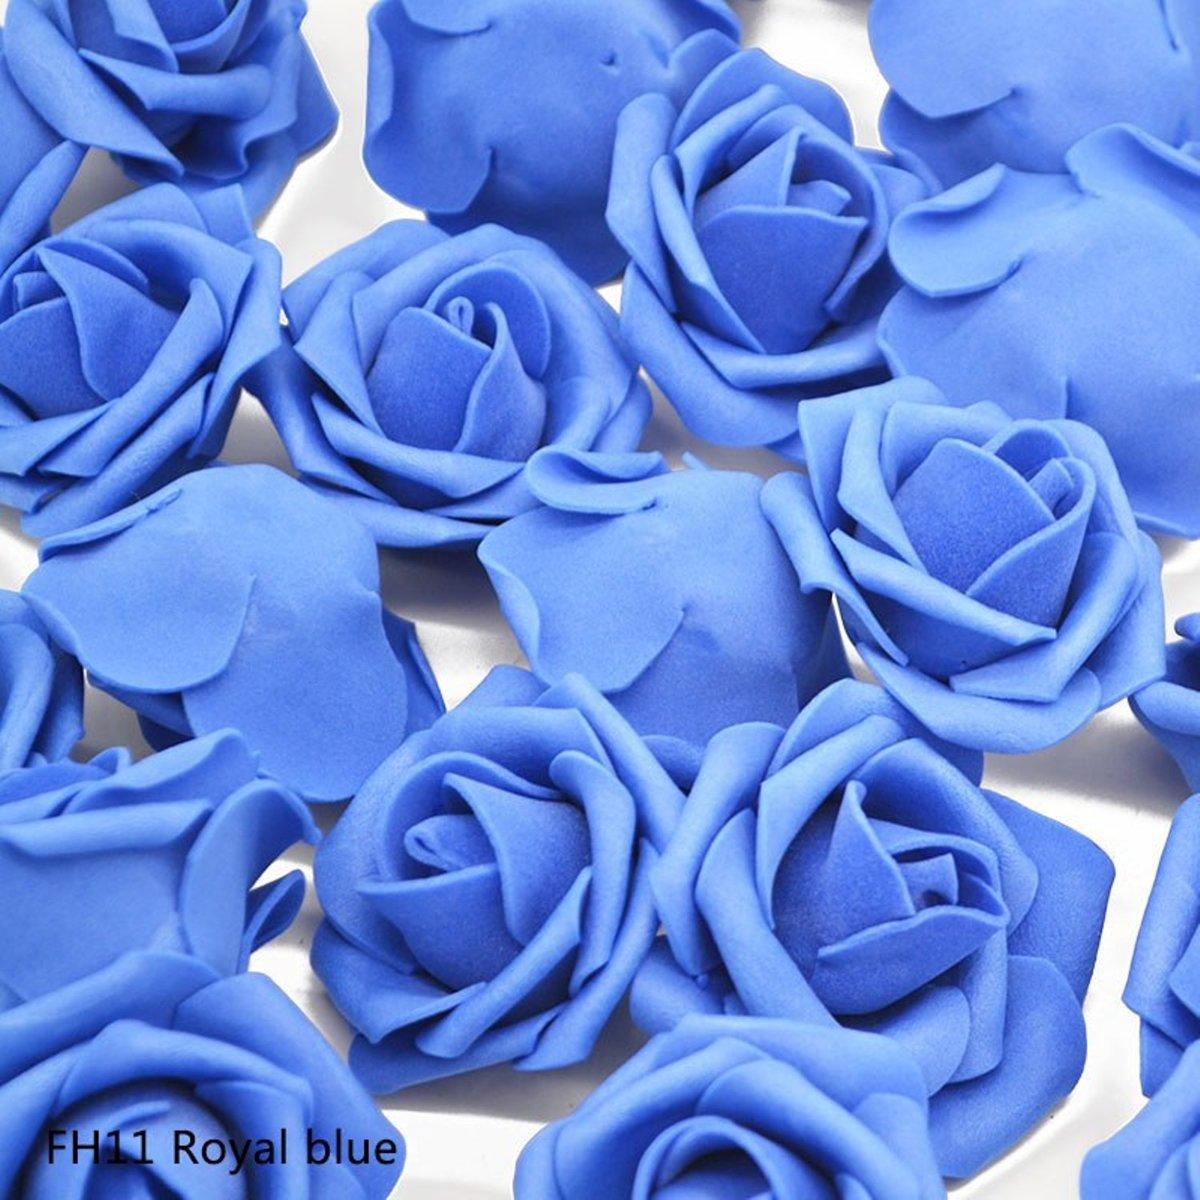 30x Schuimrozen | Foam Flower | 4cm | Royal blue kopen